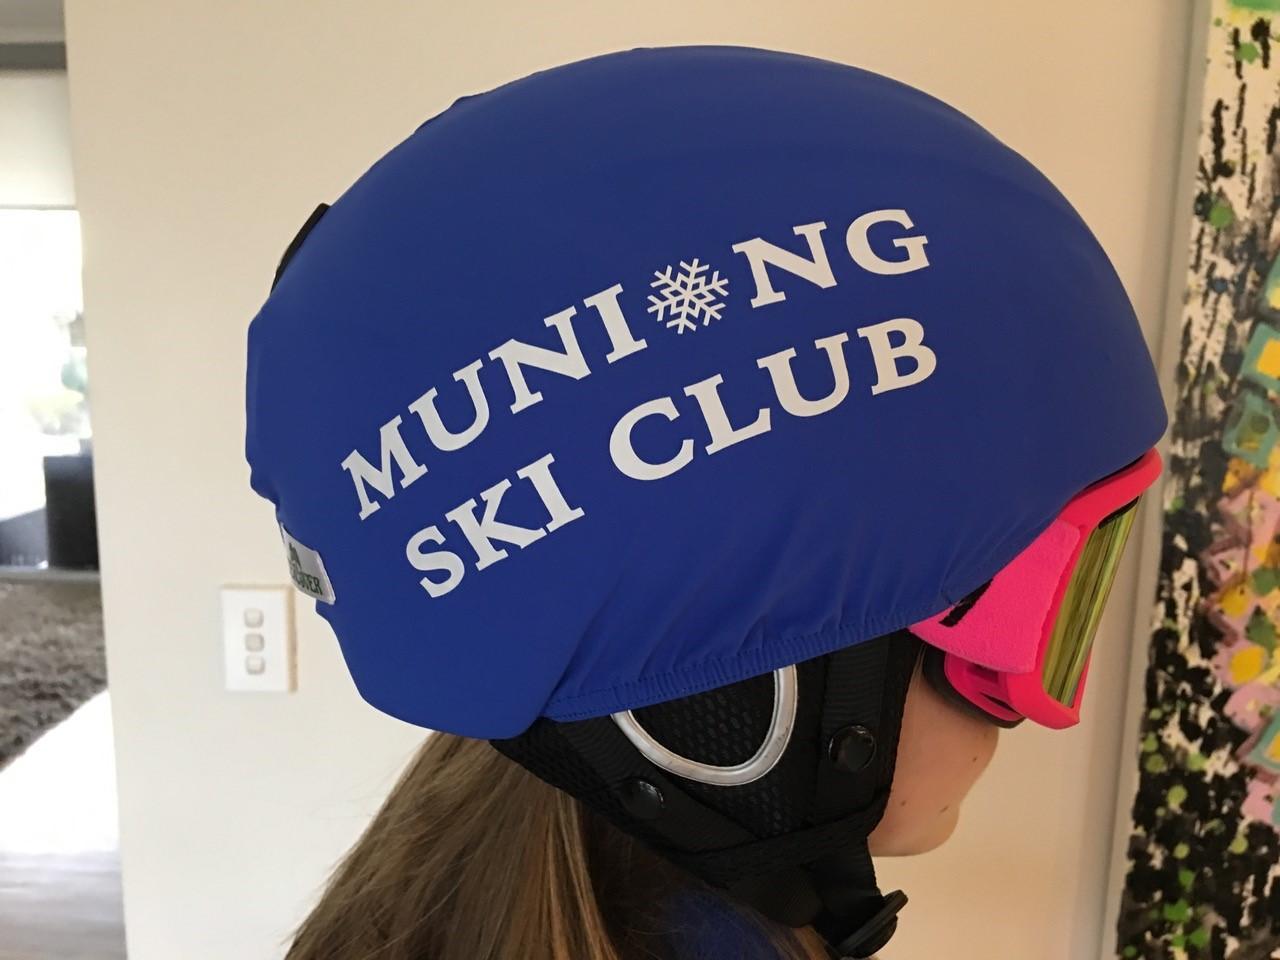 custom helmet cover with logo